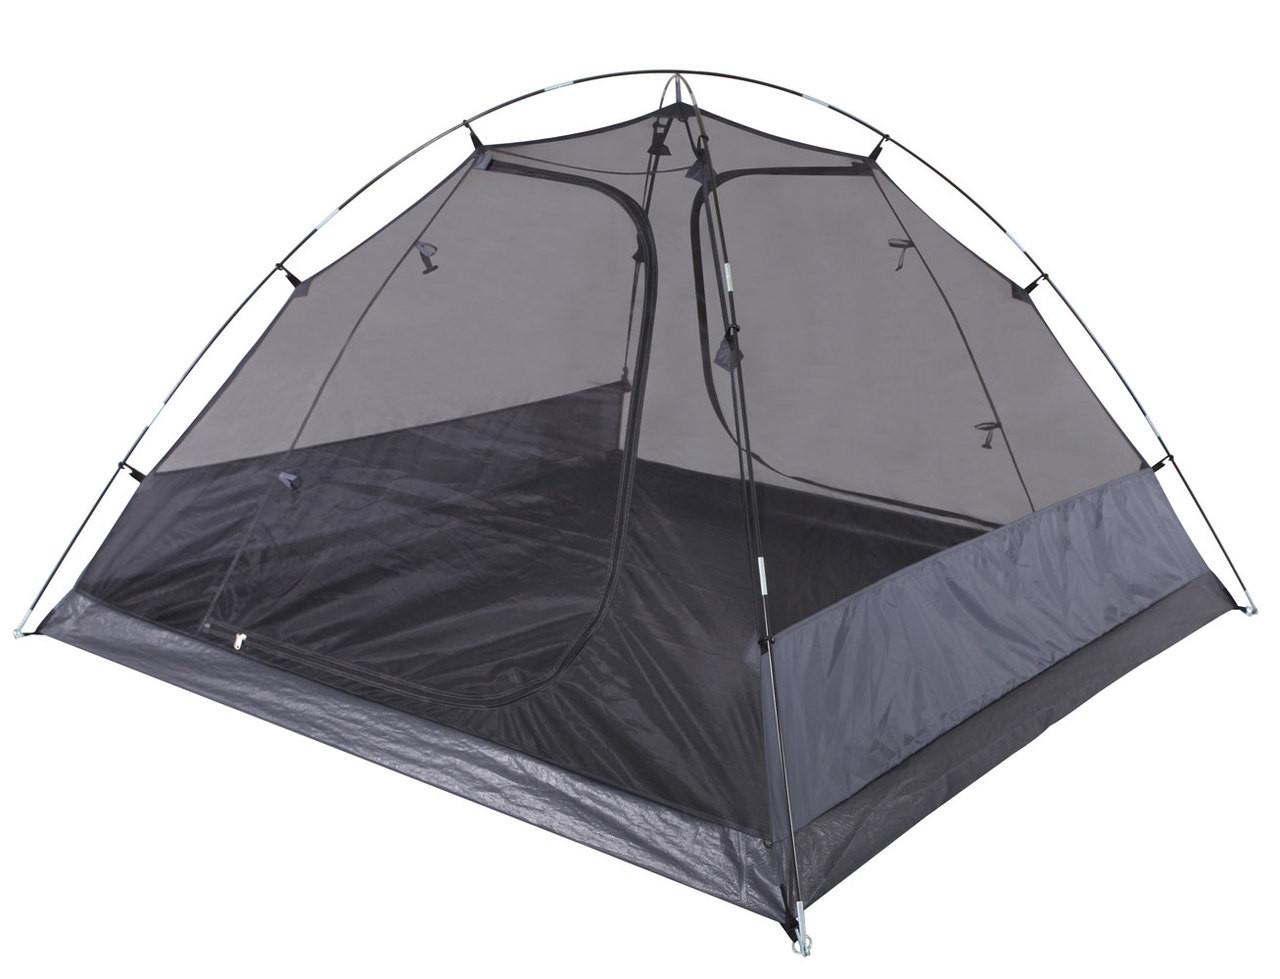 Oztrail Tasman 3V Tent mesh  sc 1 st  Fishing Tackle Shop & Oztrail Tasman 3V Tent For Sale - 3 Person Camping Tents